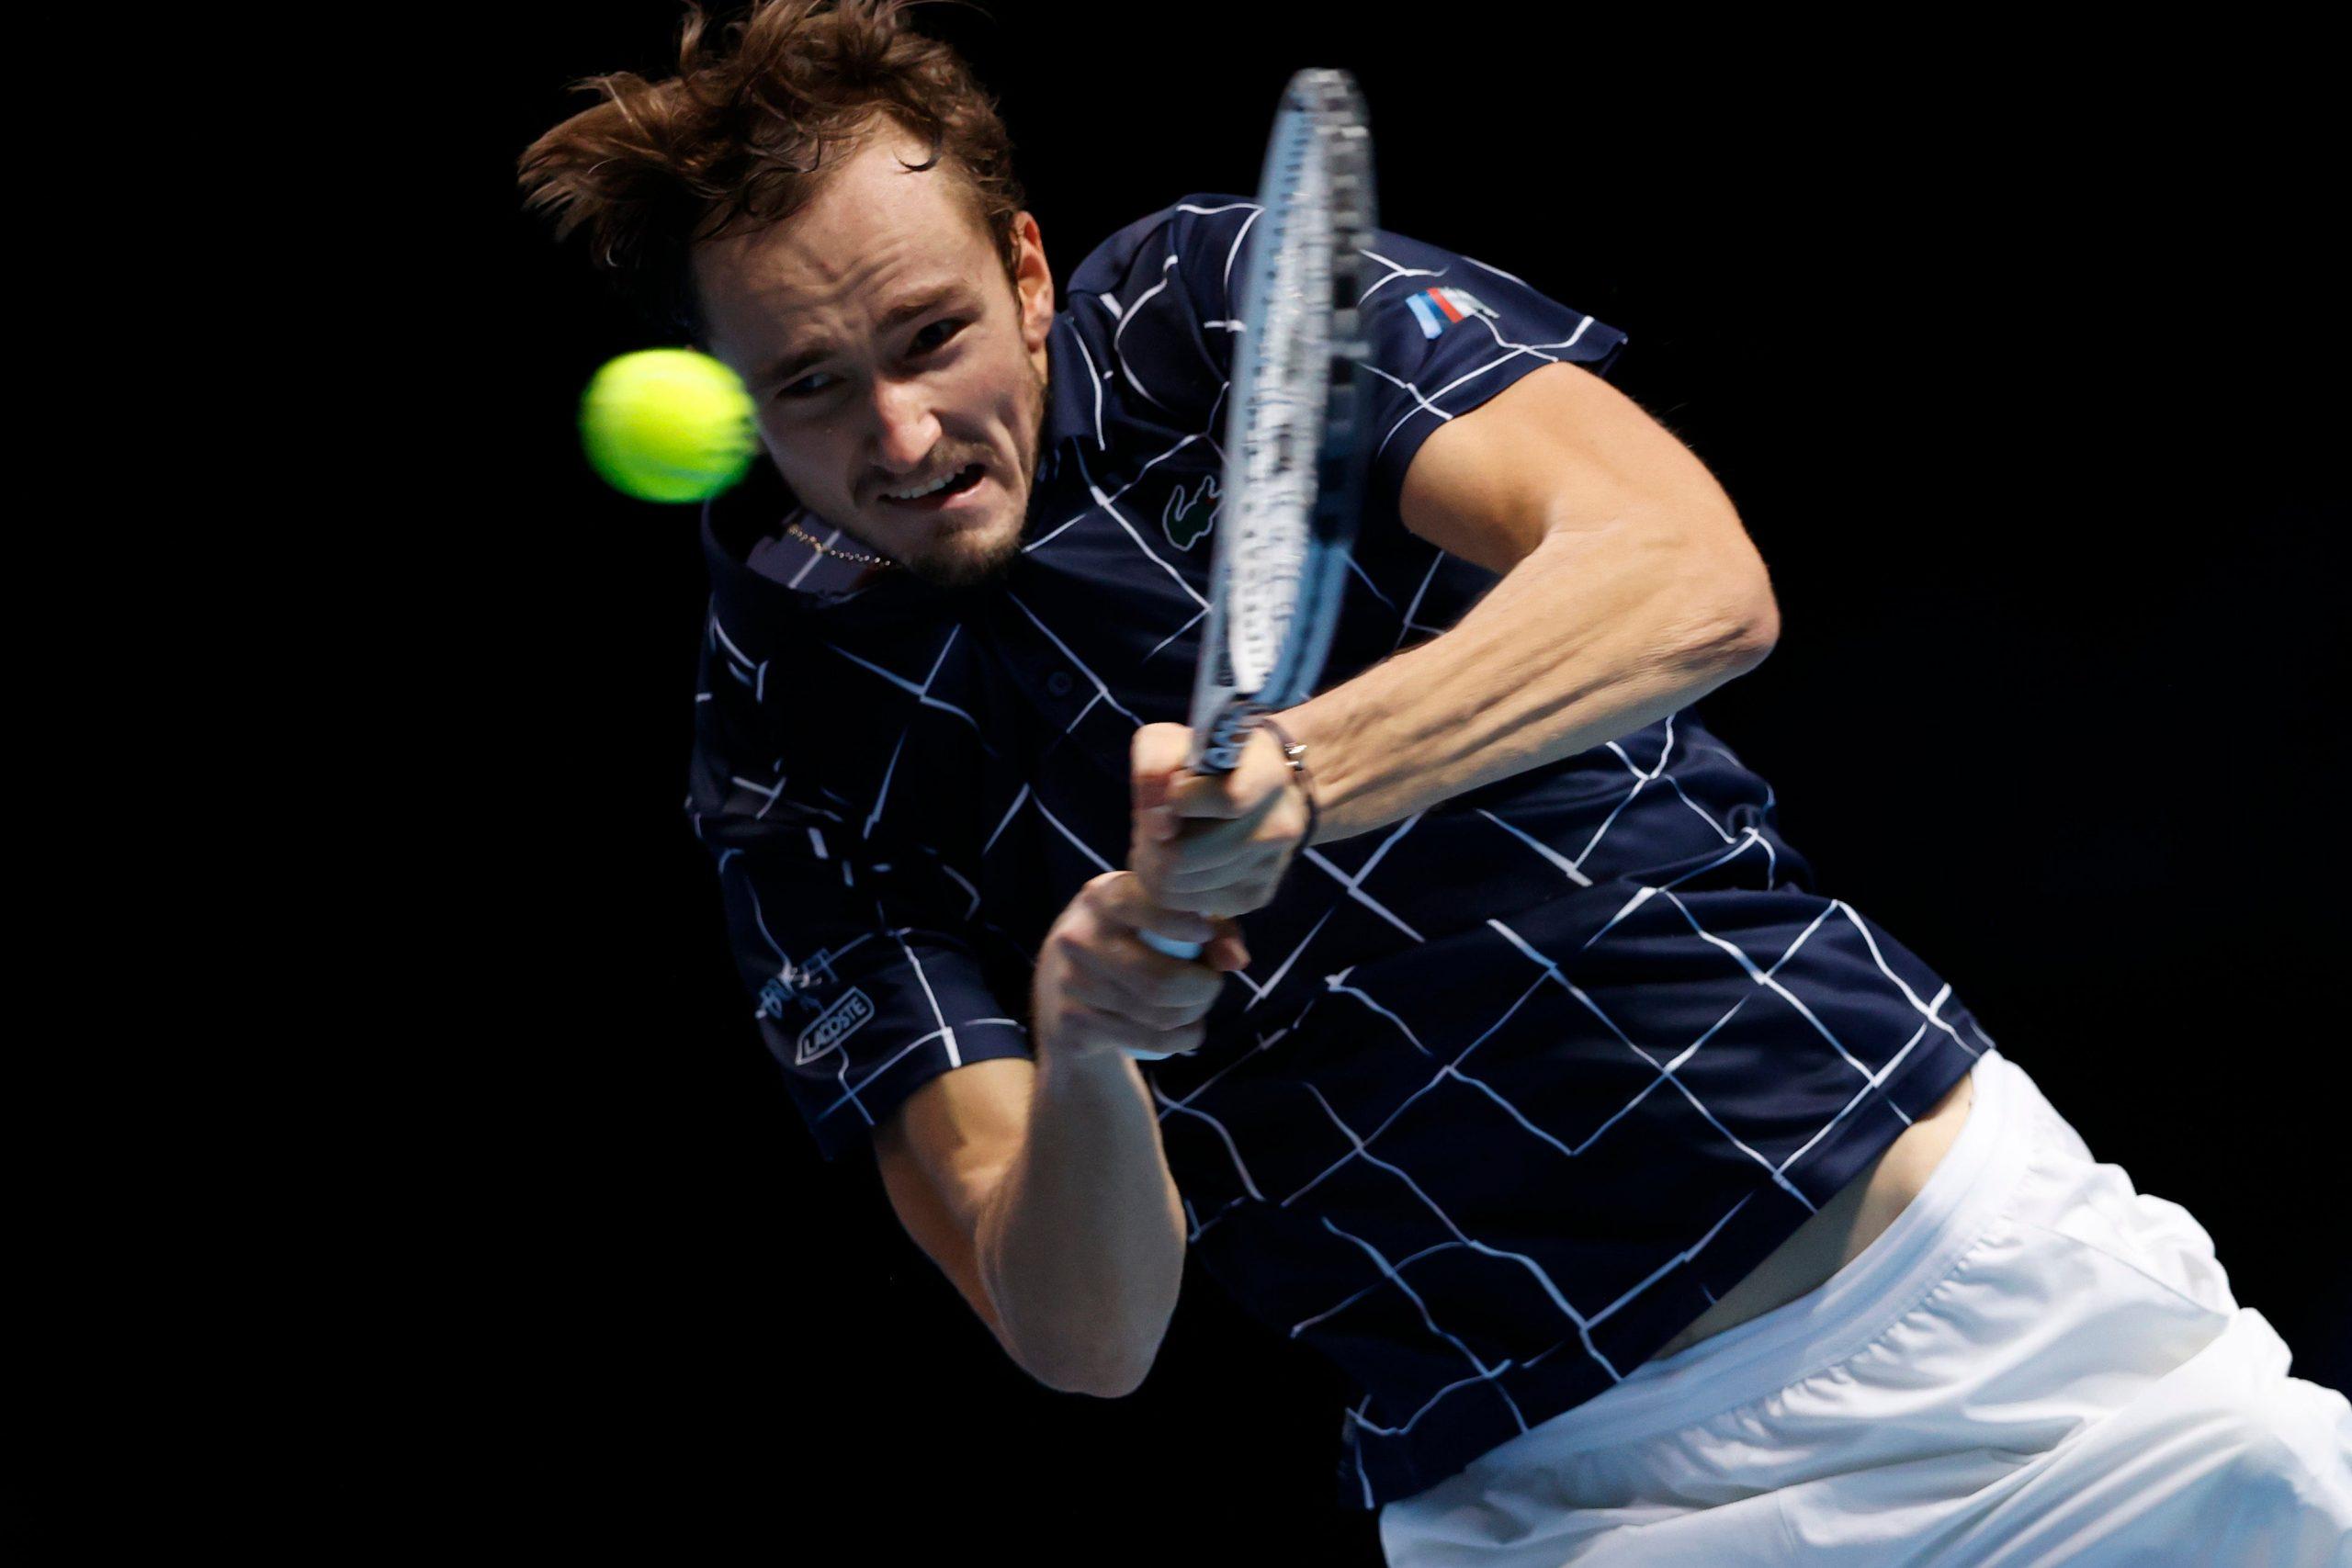 Medvedev wins with underarm serve at ATP Finals